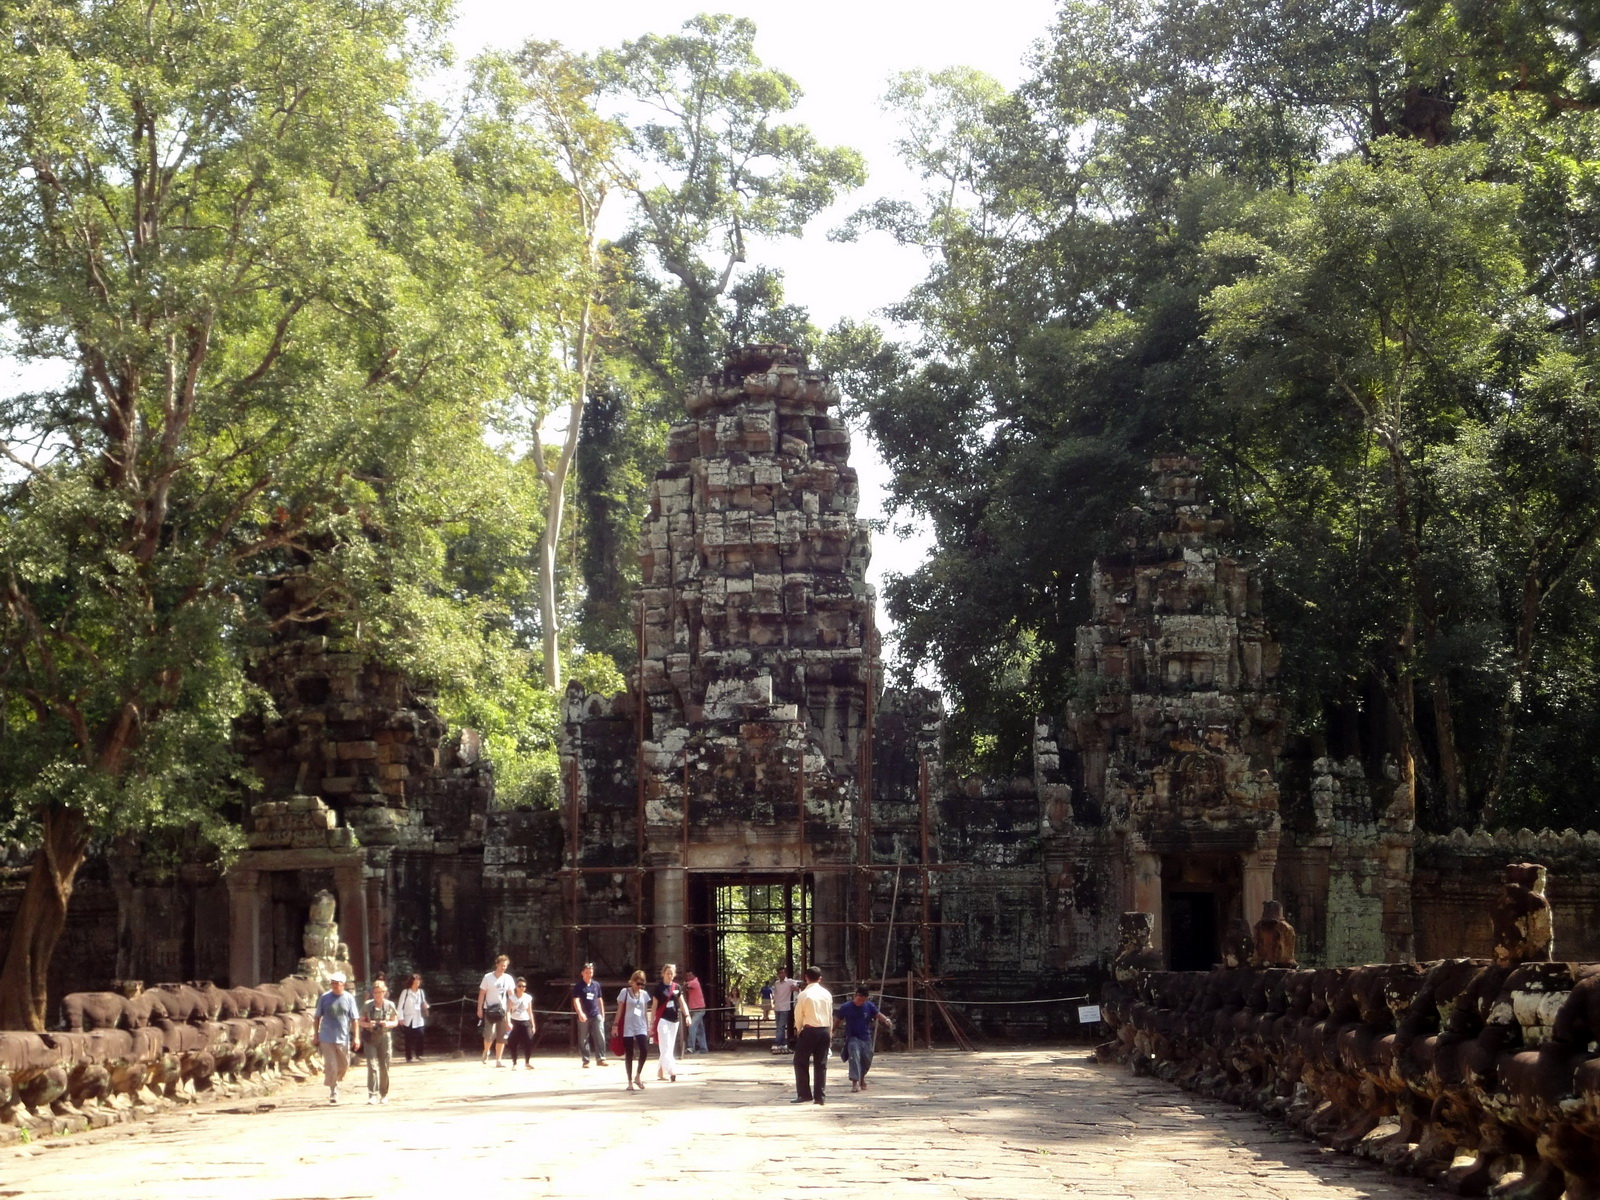 Preah Khan Temple west Gopuram entry tower naga bridge Angkor Thom 01